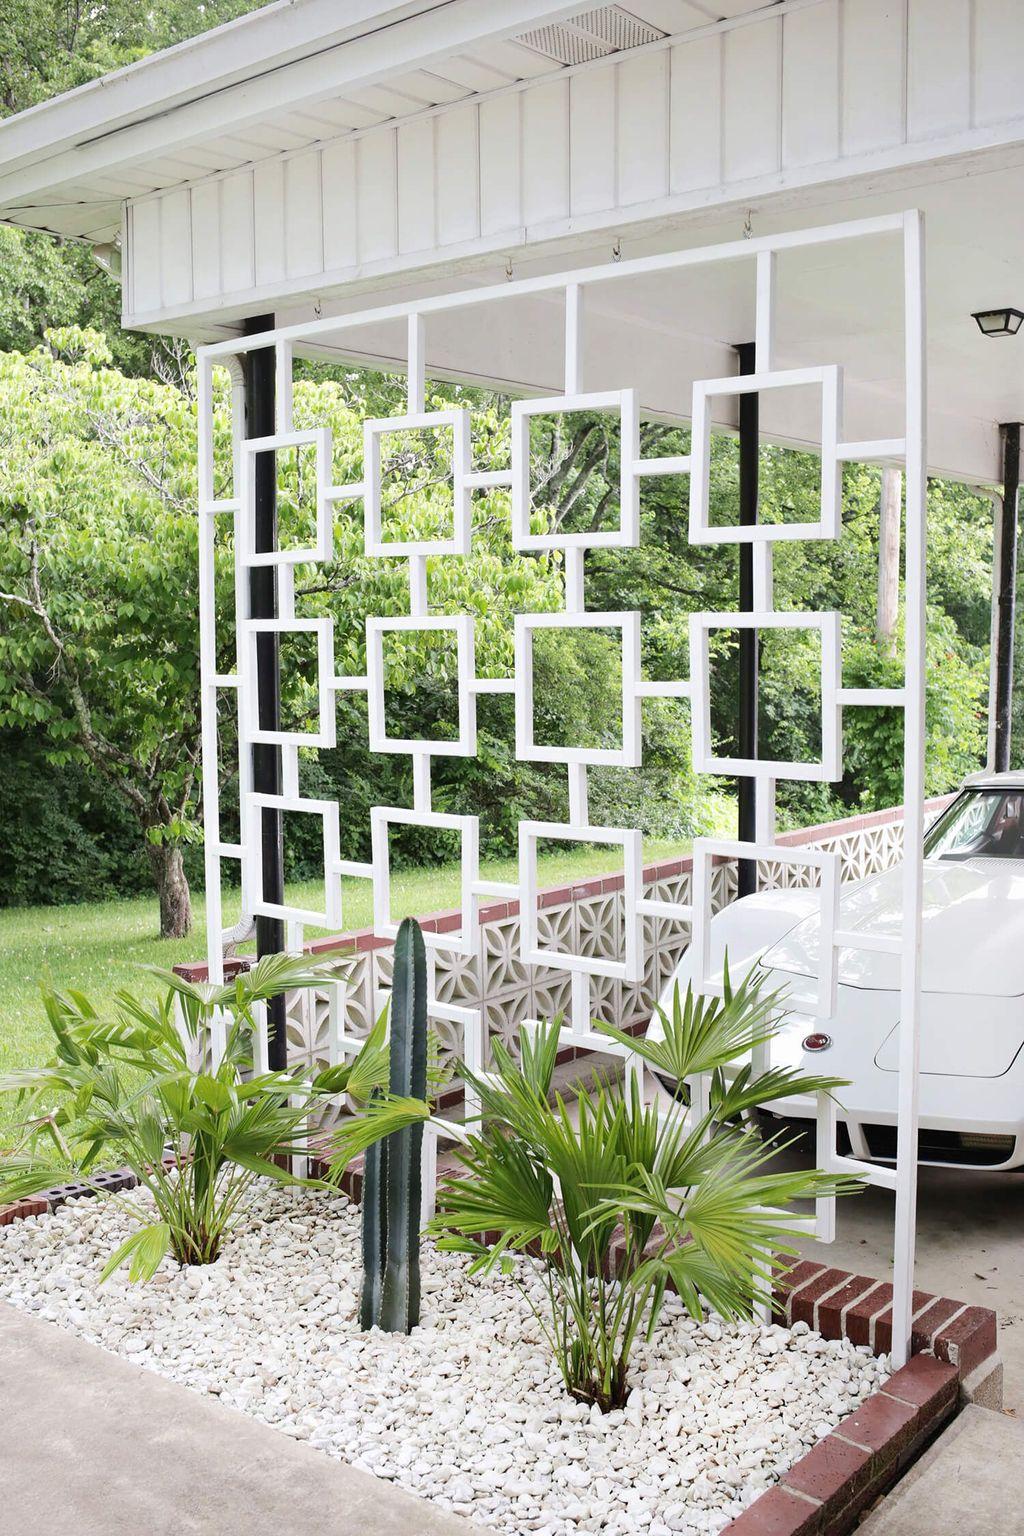 Beautiful Modern Rock Garden Ideas For Backyard Landscaping 03 Hmdcrtn,Magazine Customer Service